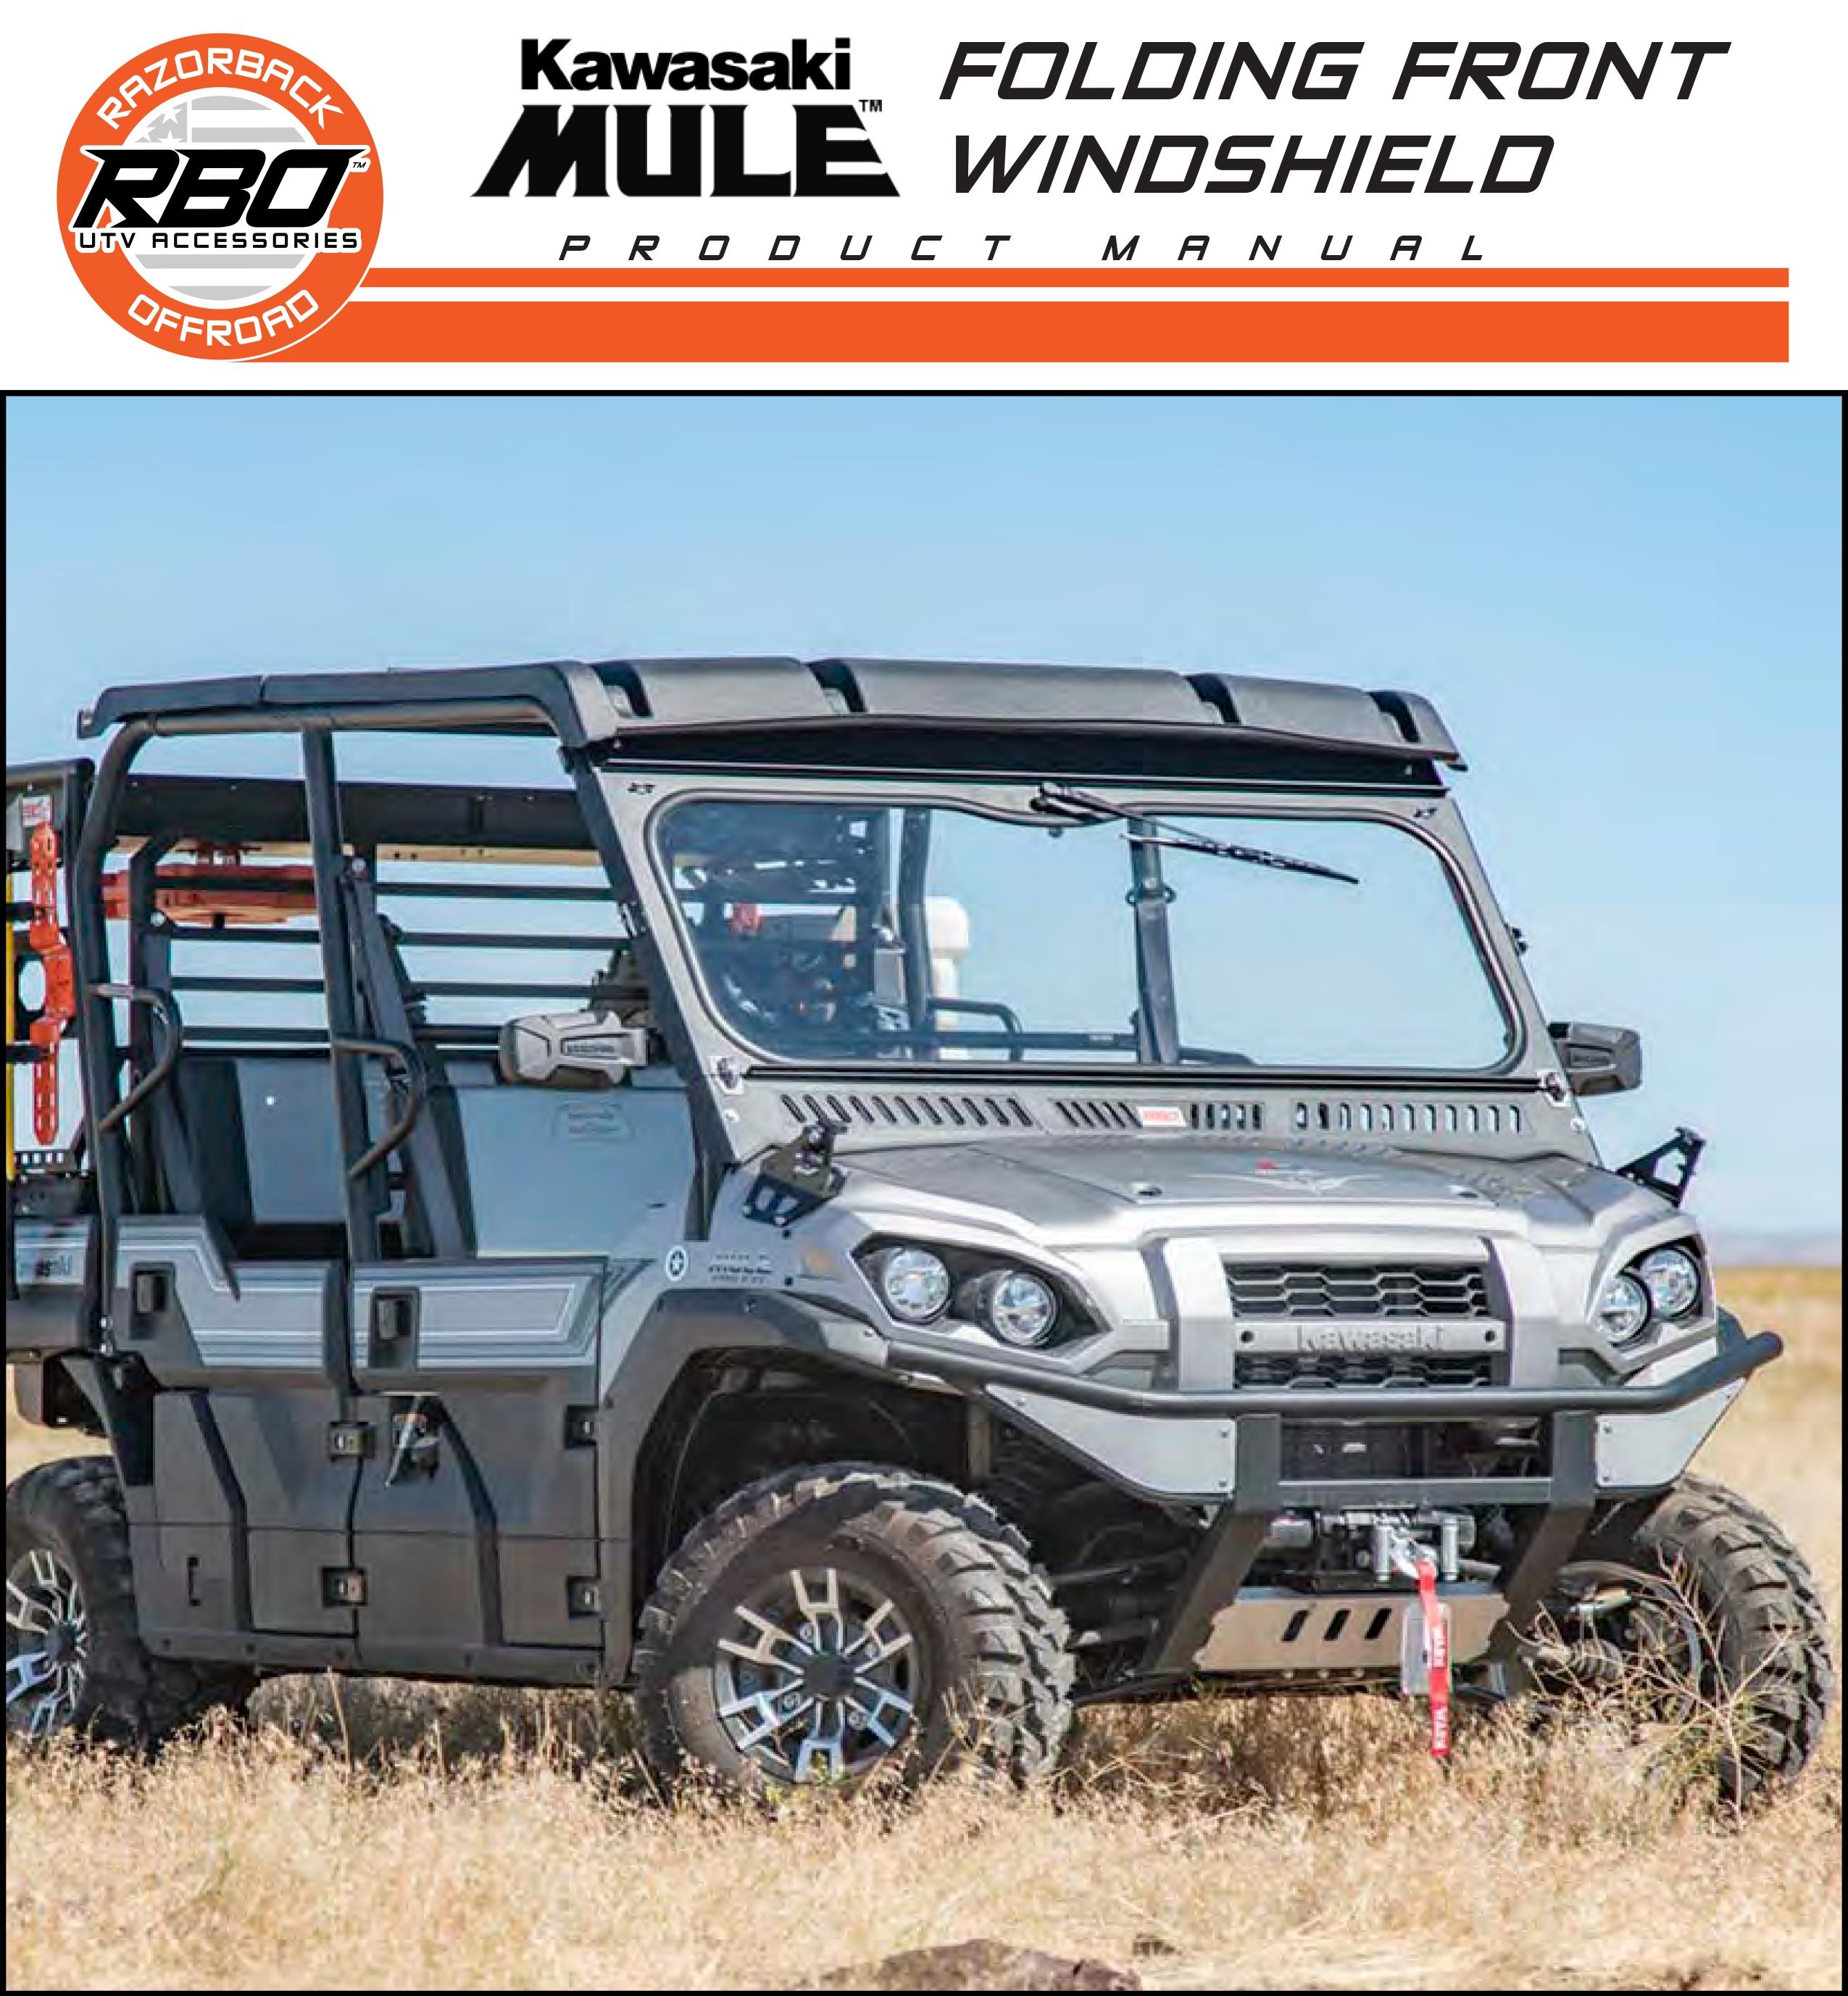 RBO Kawasaki Mule Folding Front Windshield Product Manual